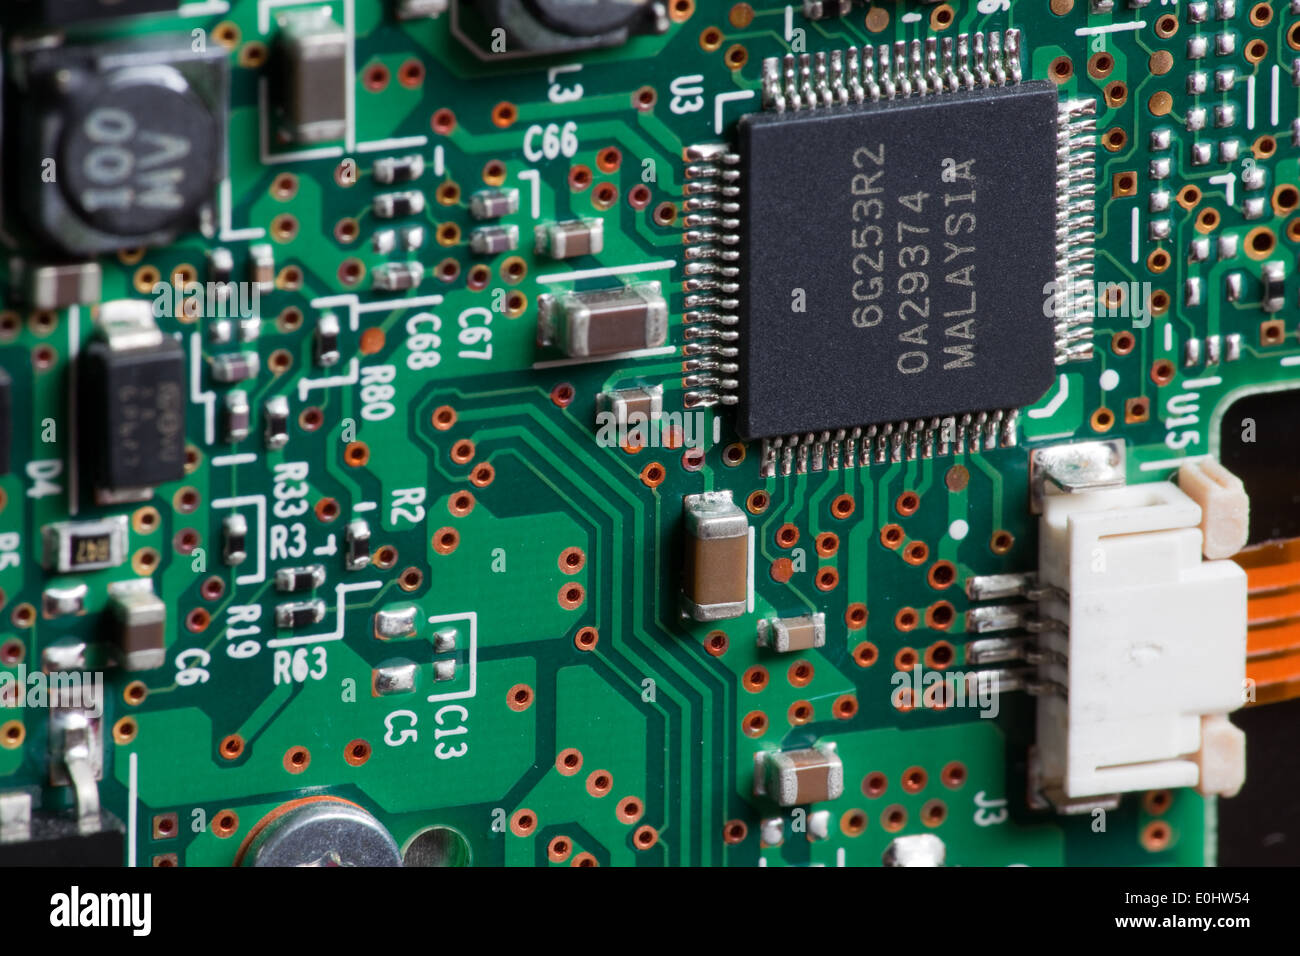 Elektronik, Platine - Electronic, circuit board Stock Photo ...